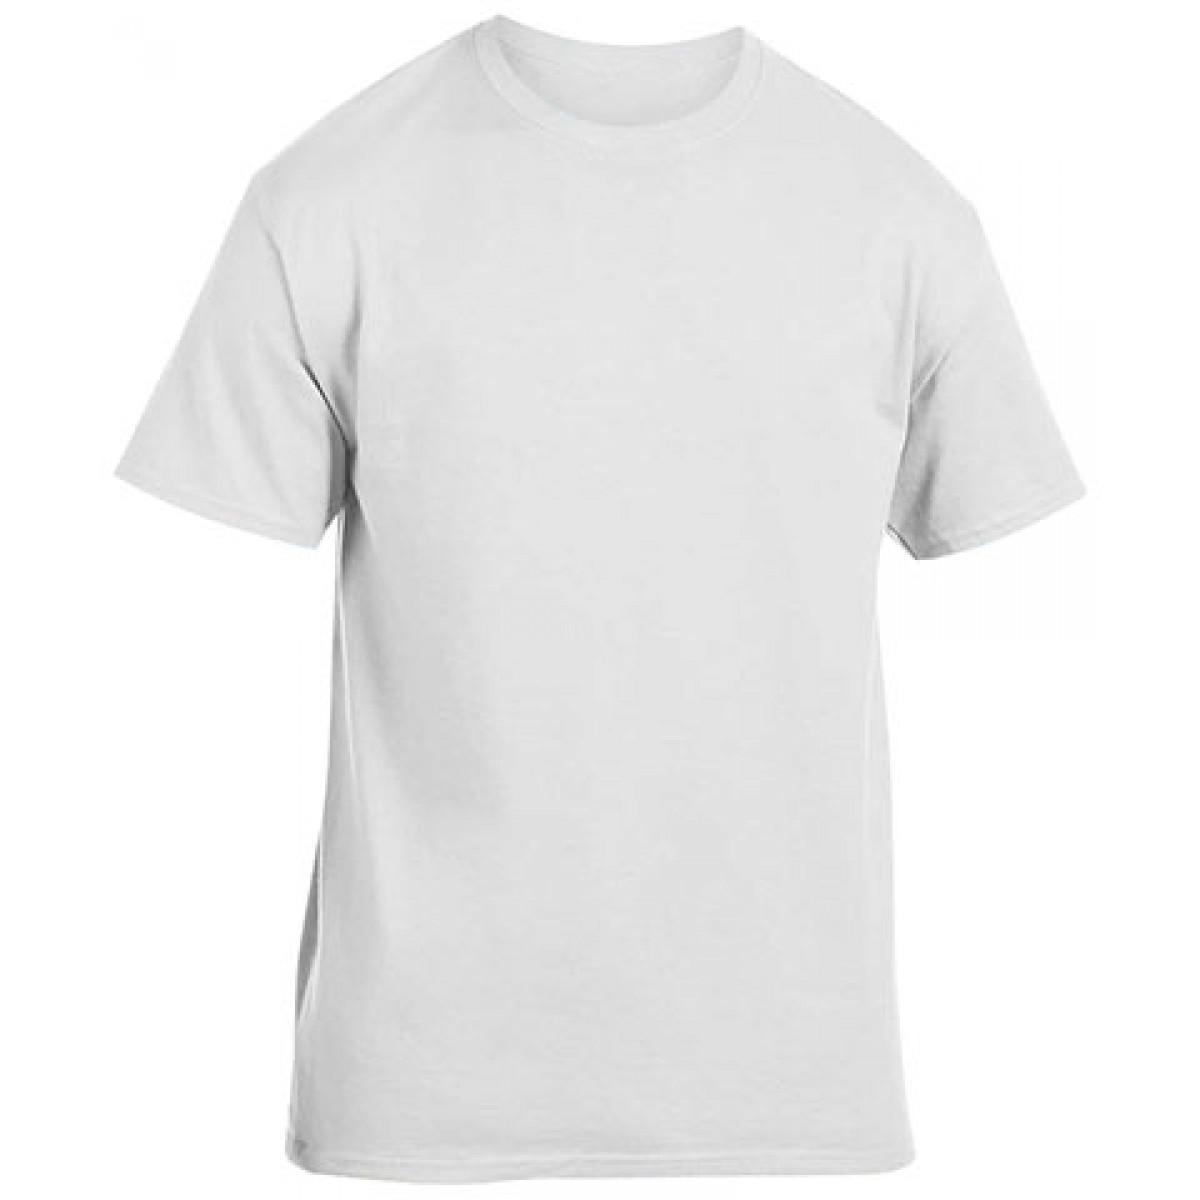 Cotton Short Sleeve T-Shirt-White-S